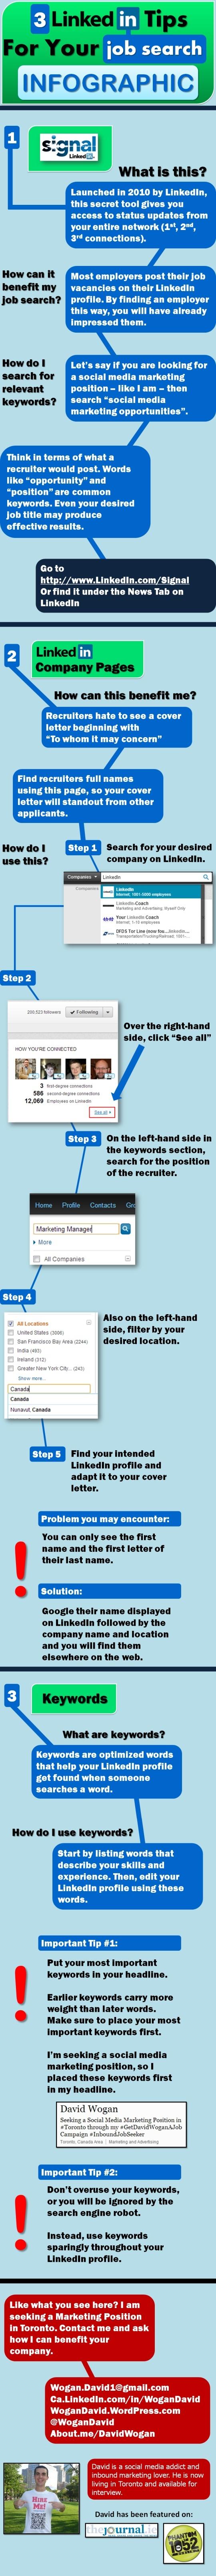 3 Linkedin Tips For Your Job Search @ Pinfographics